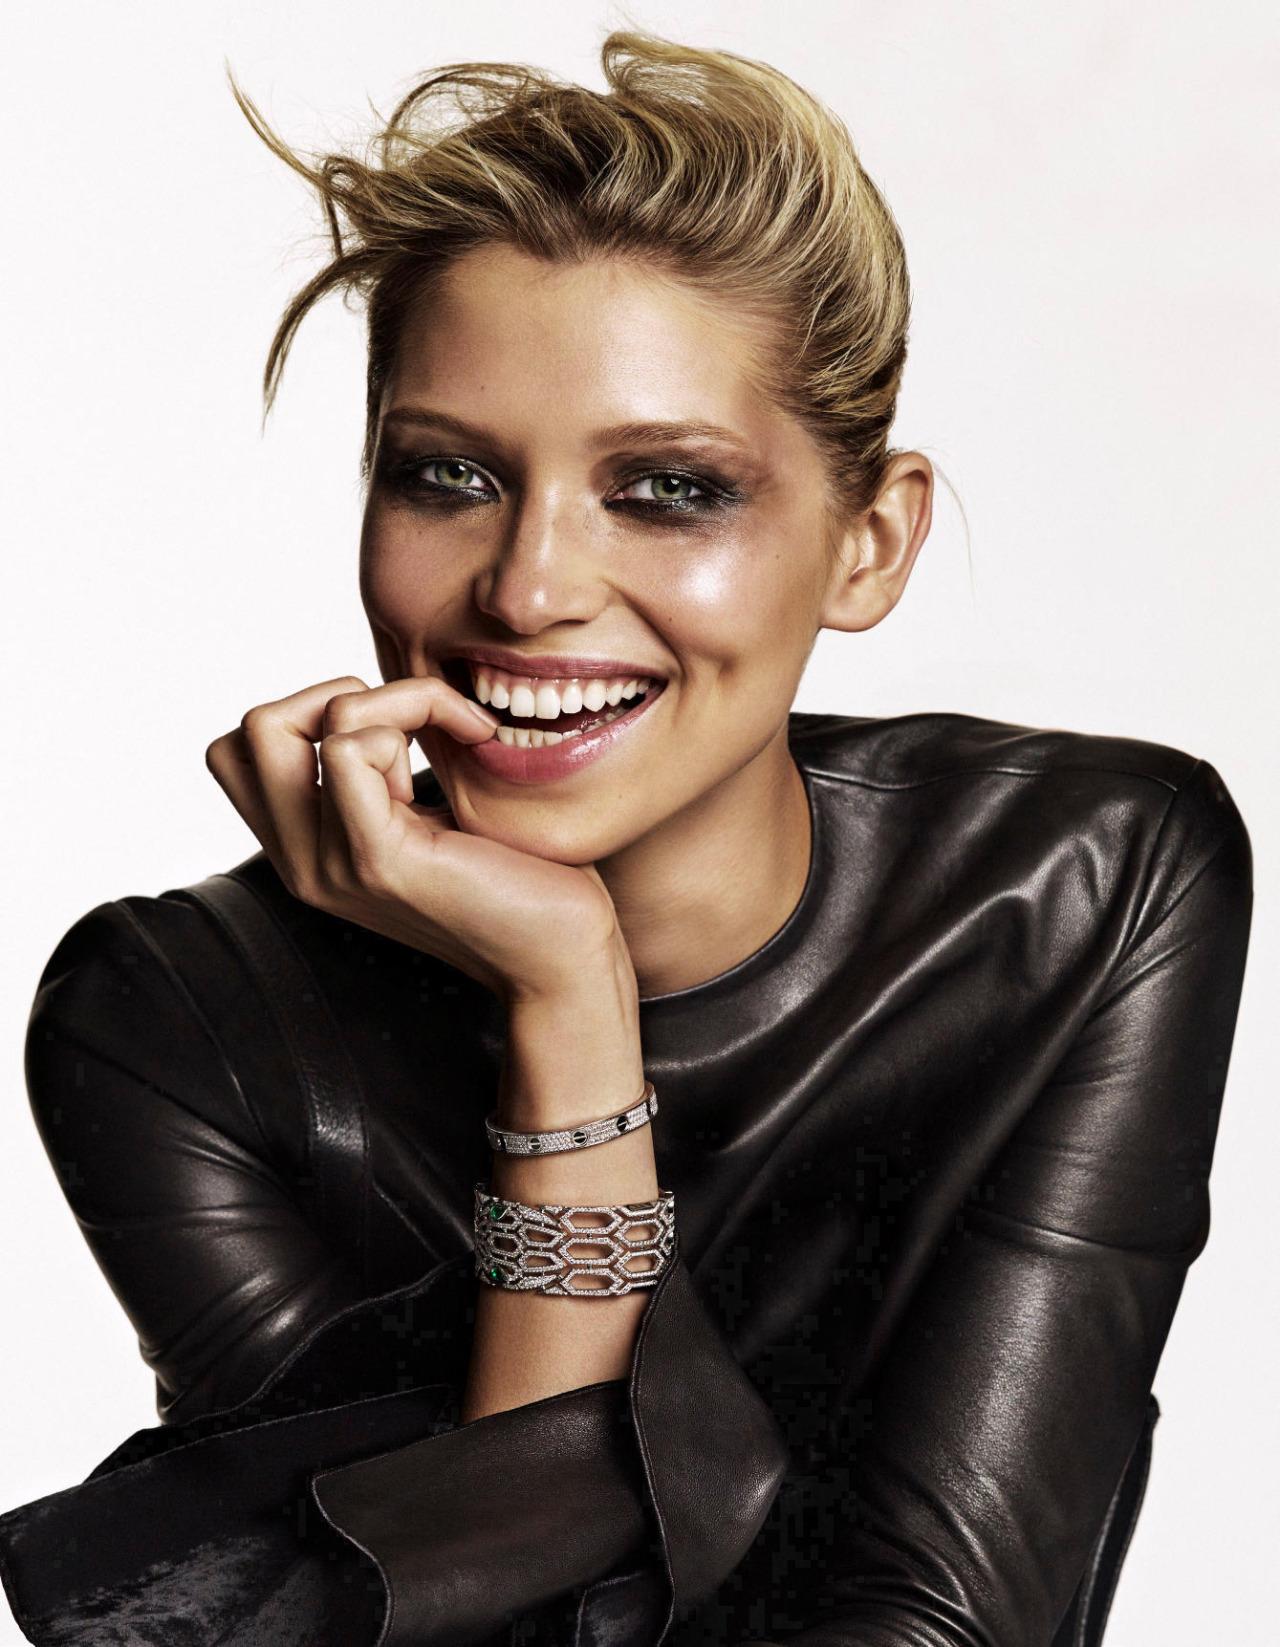 Hana Jirickova photographed by Alique for Vogue Netherlands, November 2016